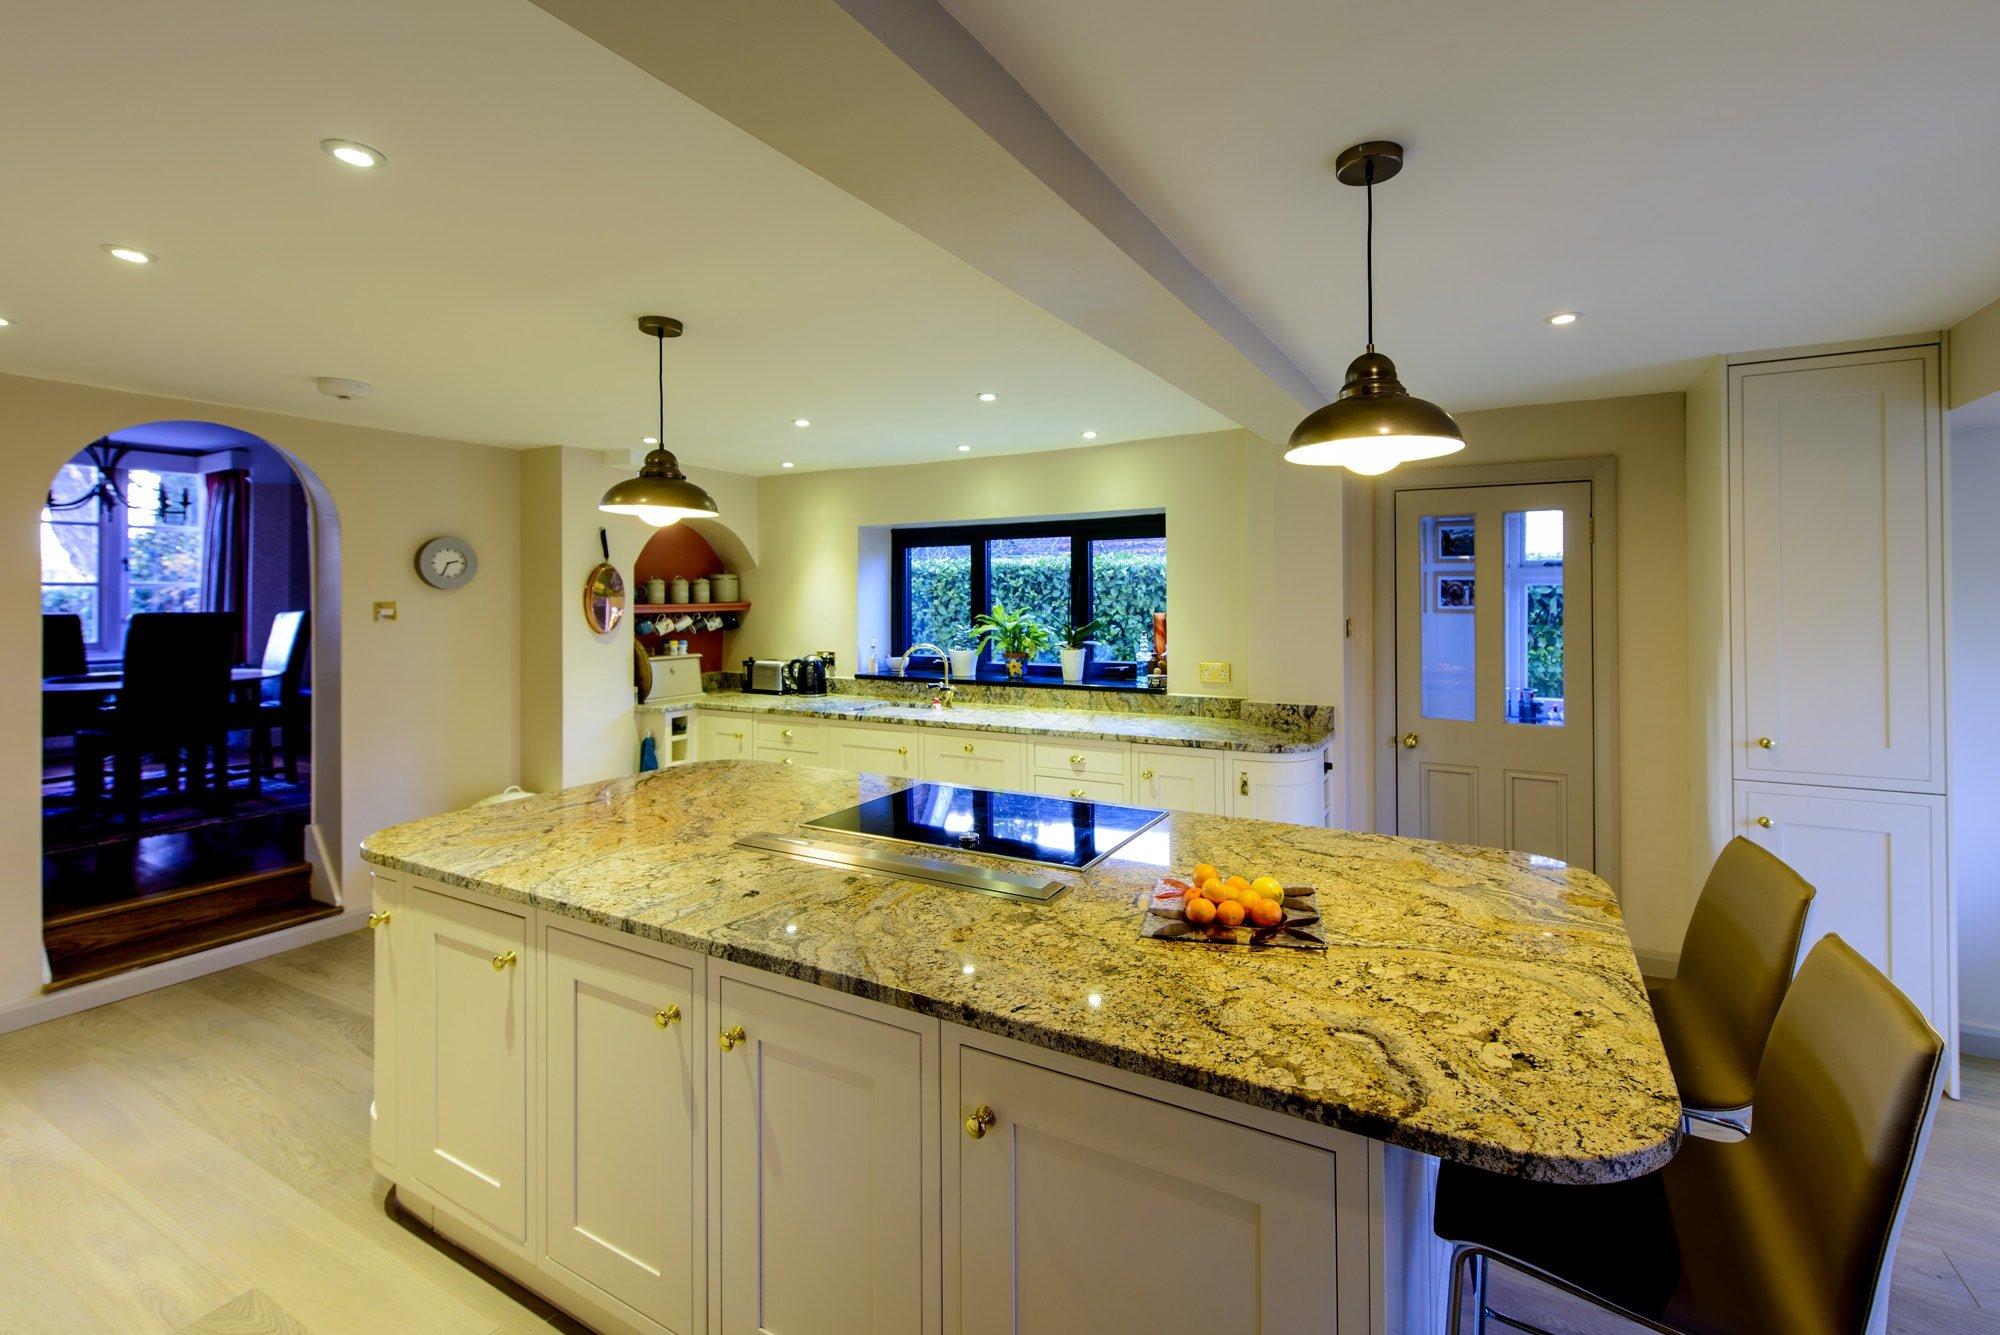 paisley-gold-granite-betchworth-surrey-15335111-island-min